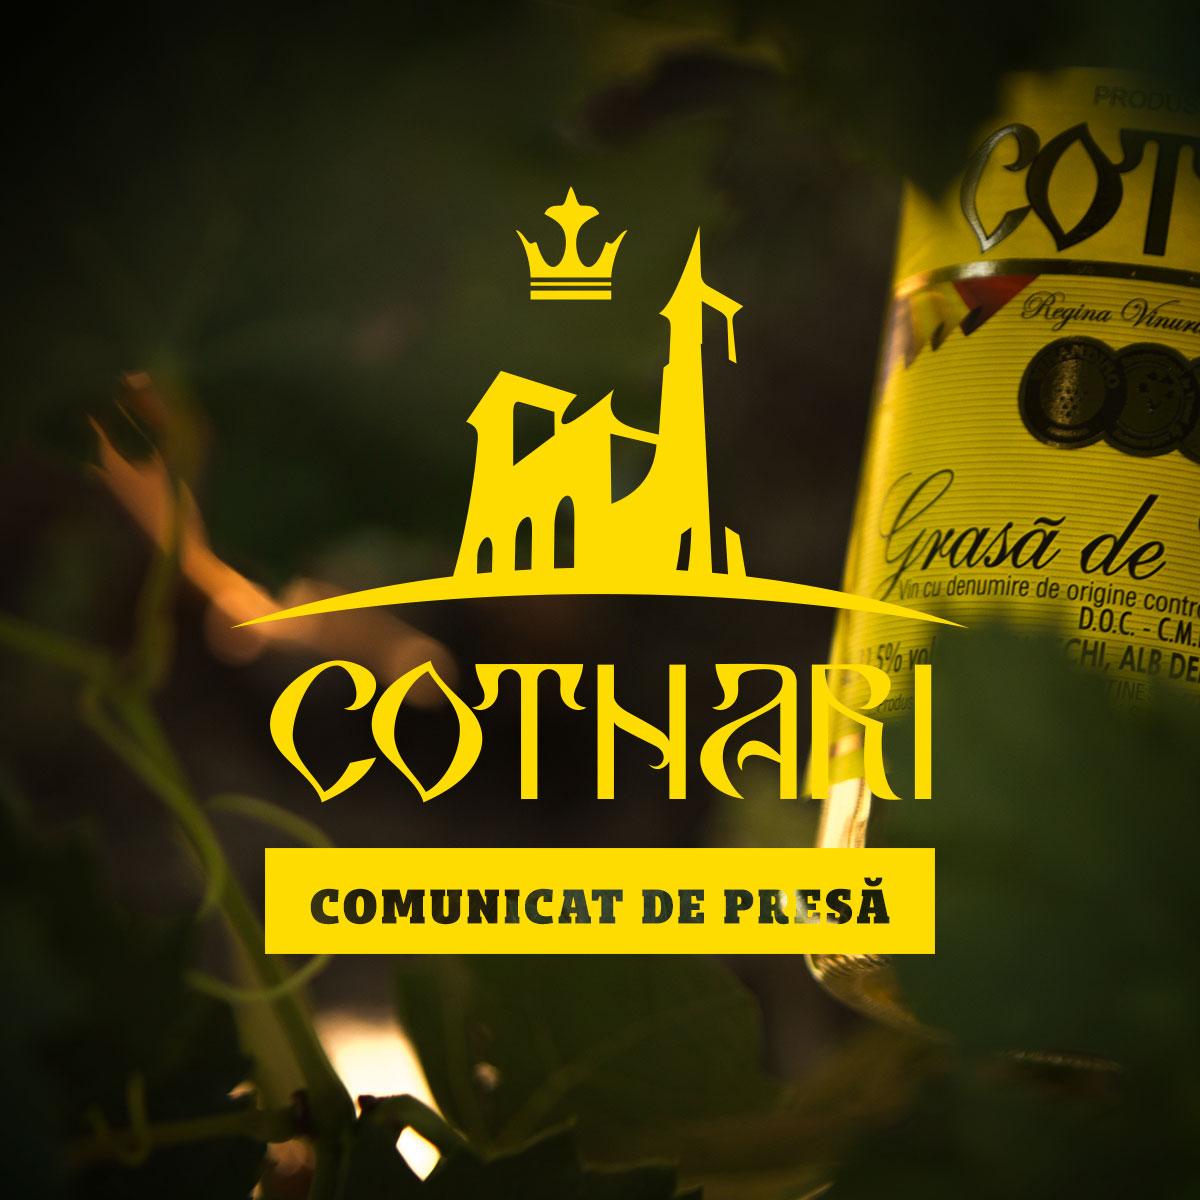 https://www.cotnari.ro/continut/uploads/2017/08/comunicat4.jpg